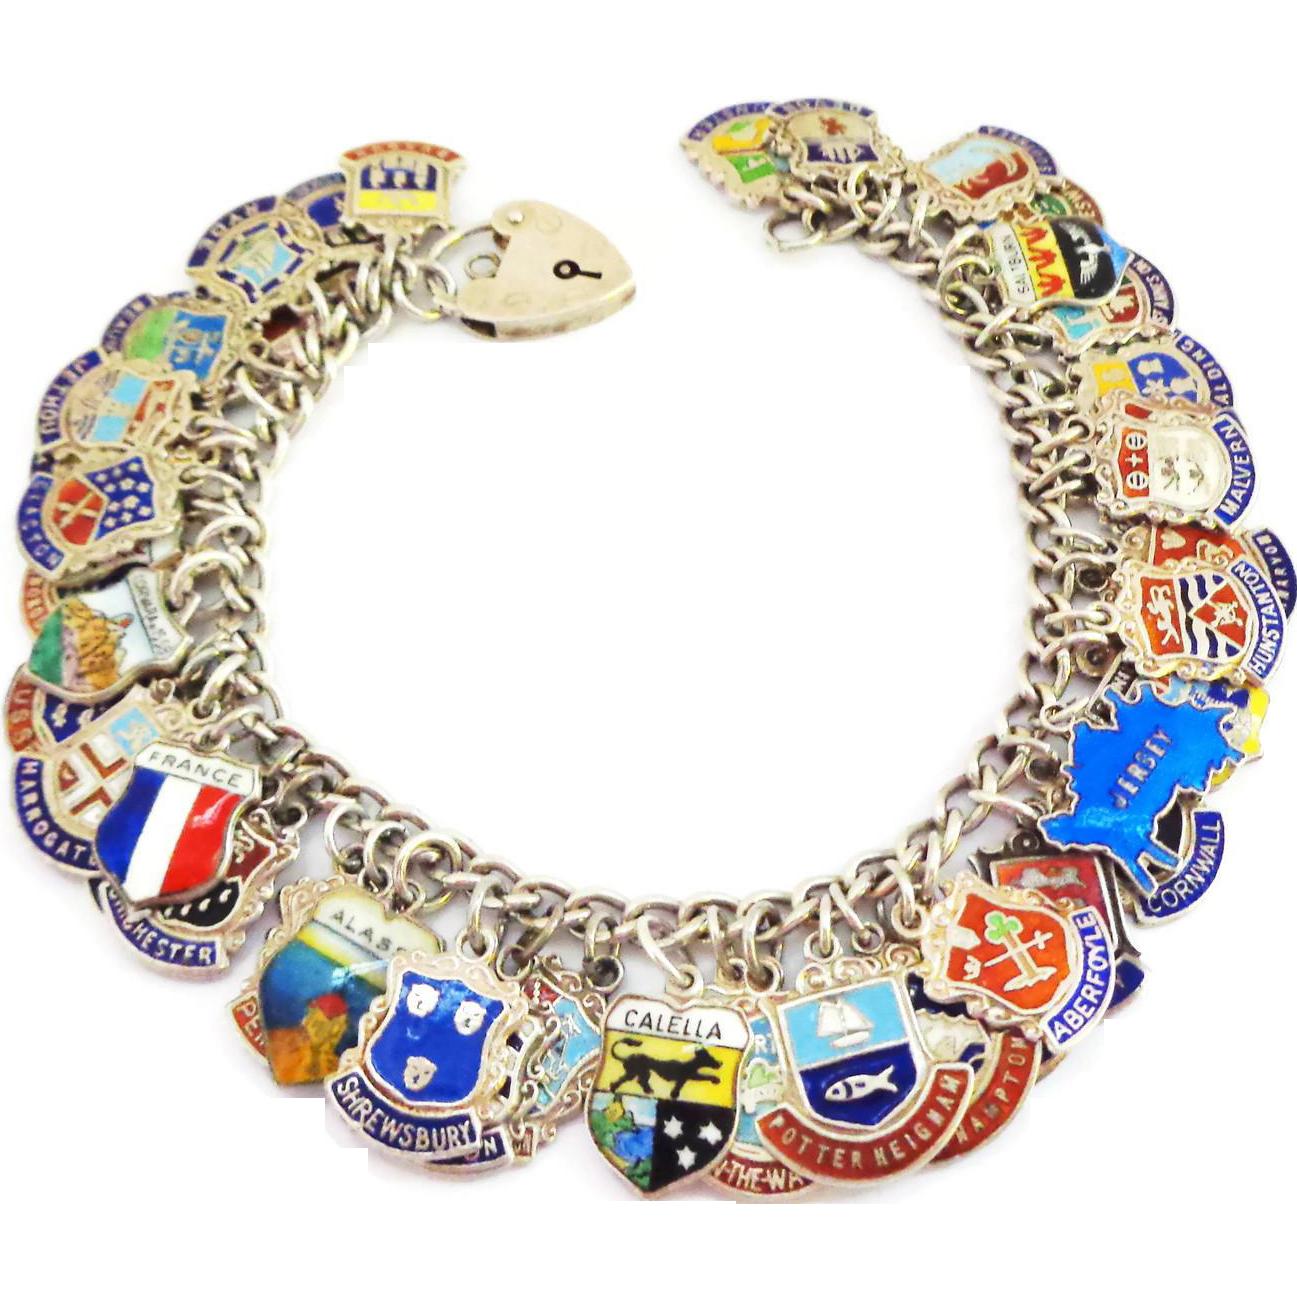 52 Fully Loaded Enamel on Silver Travel Charms on Sterling Silver Bracelet - UK